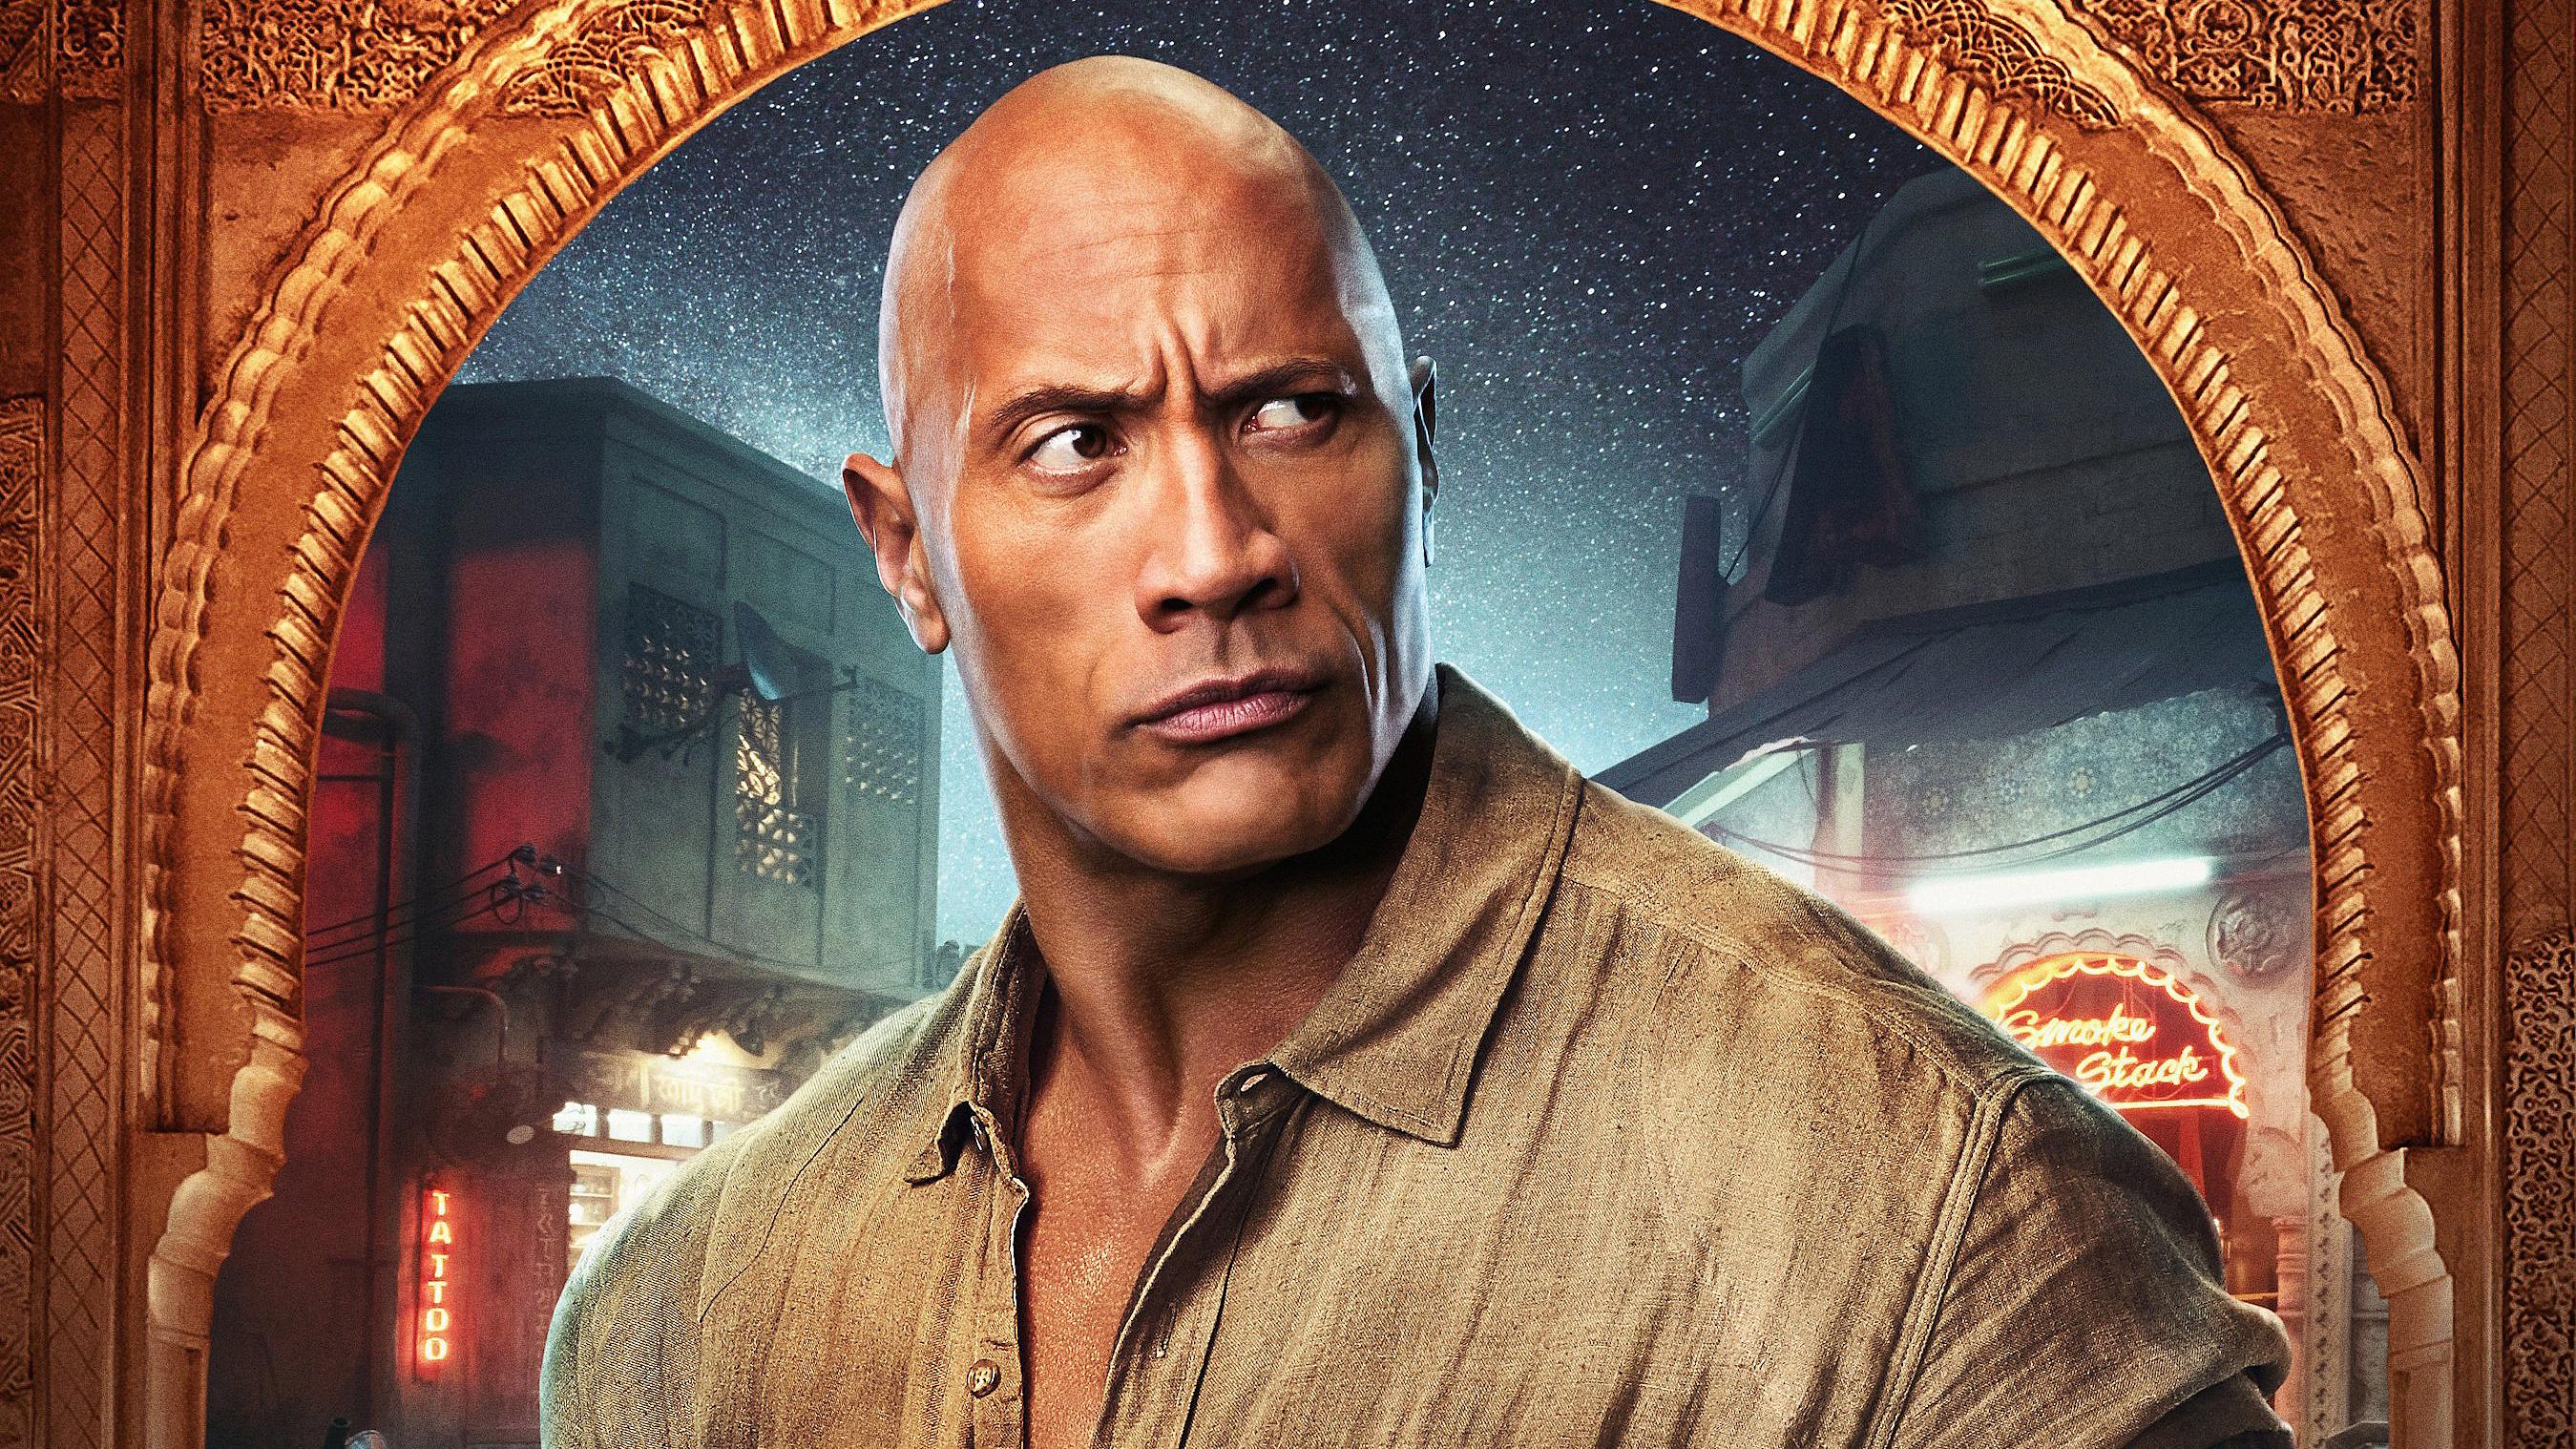 Dwayne Johnson Jumanji The Next Level Hd Movies 4k